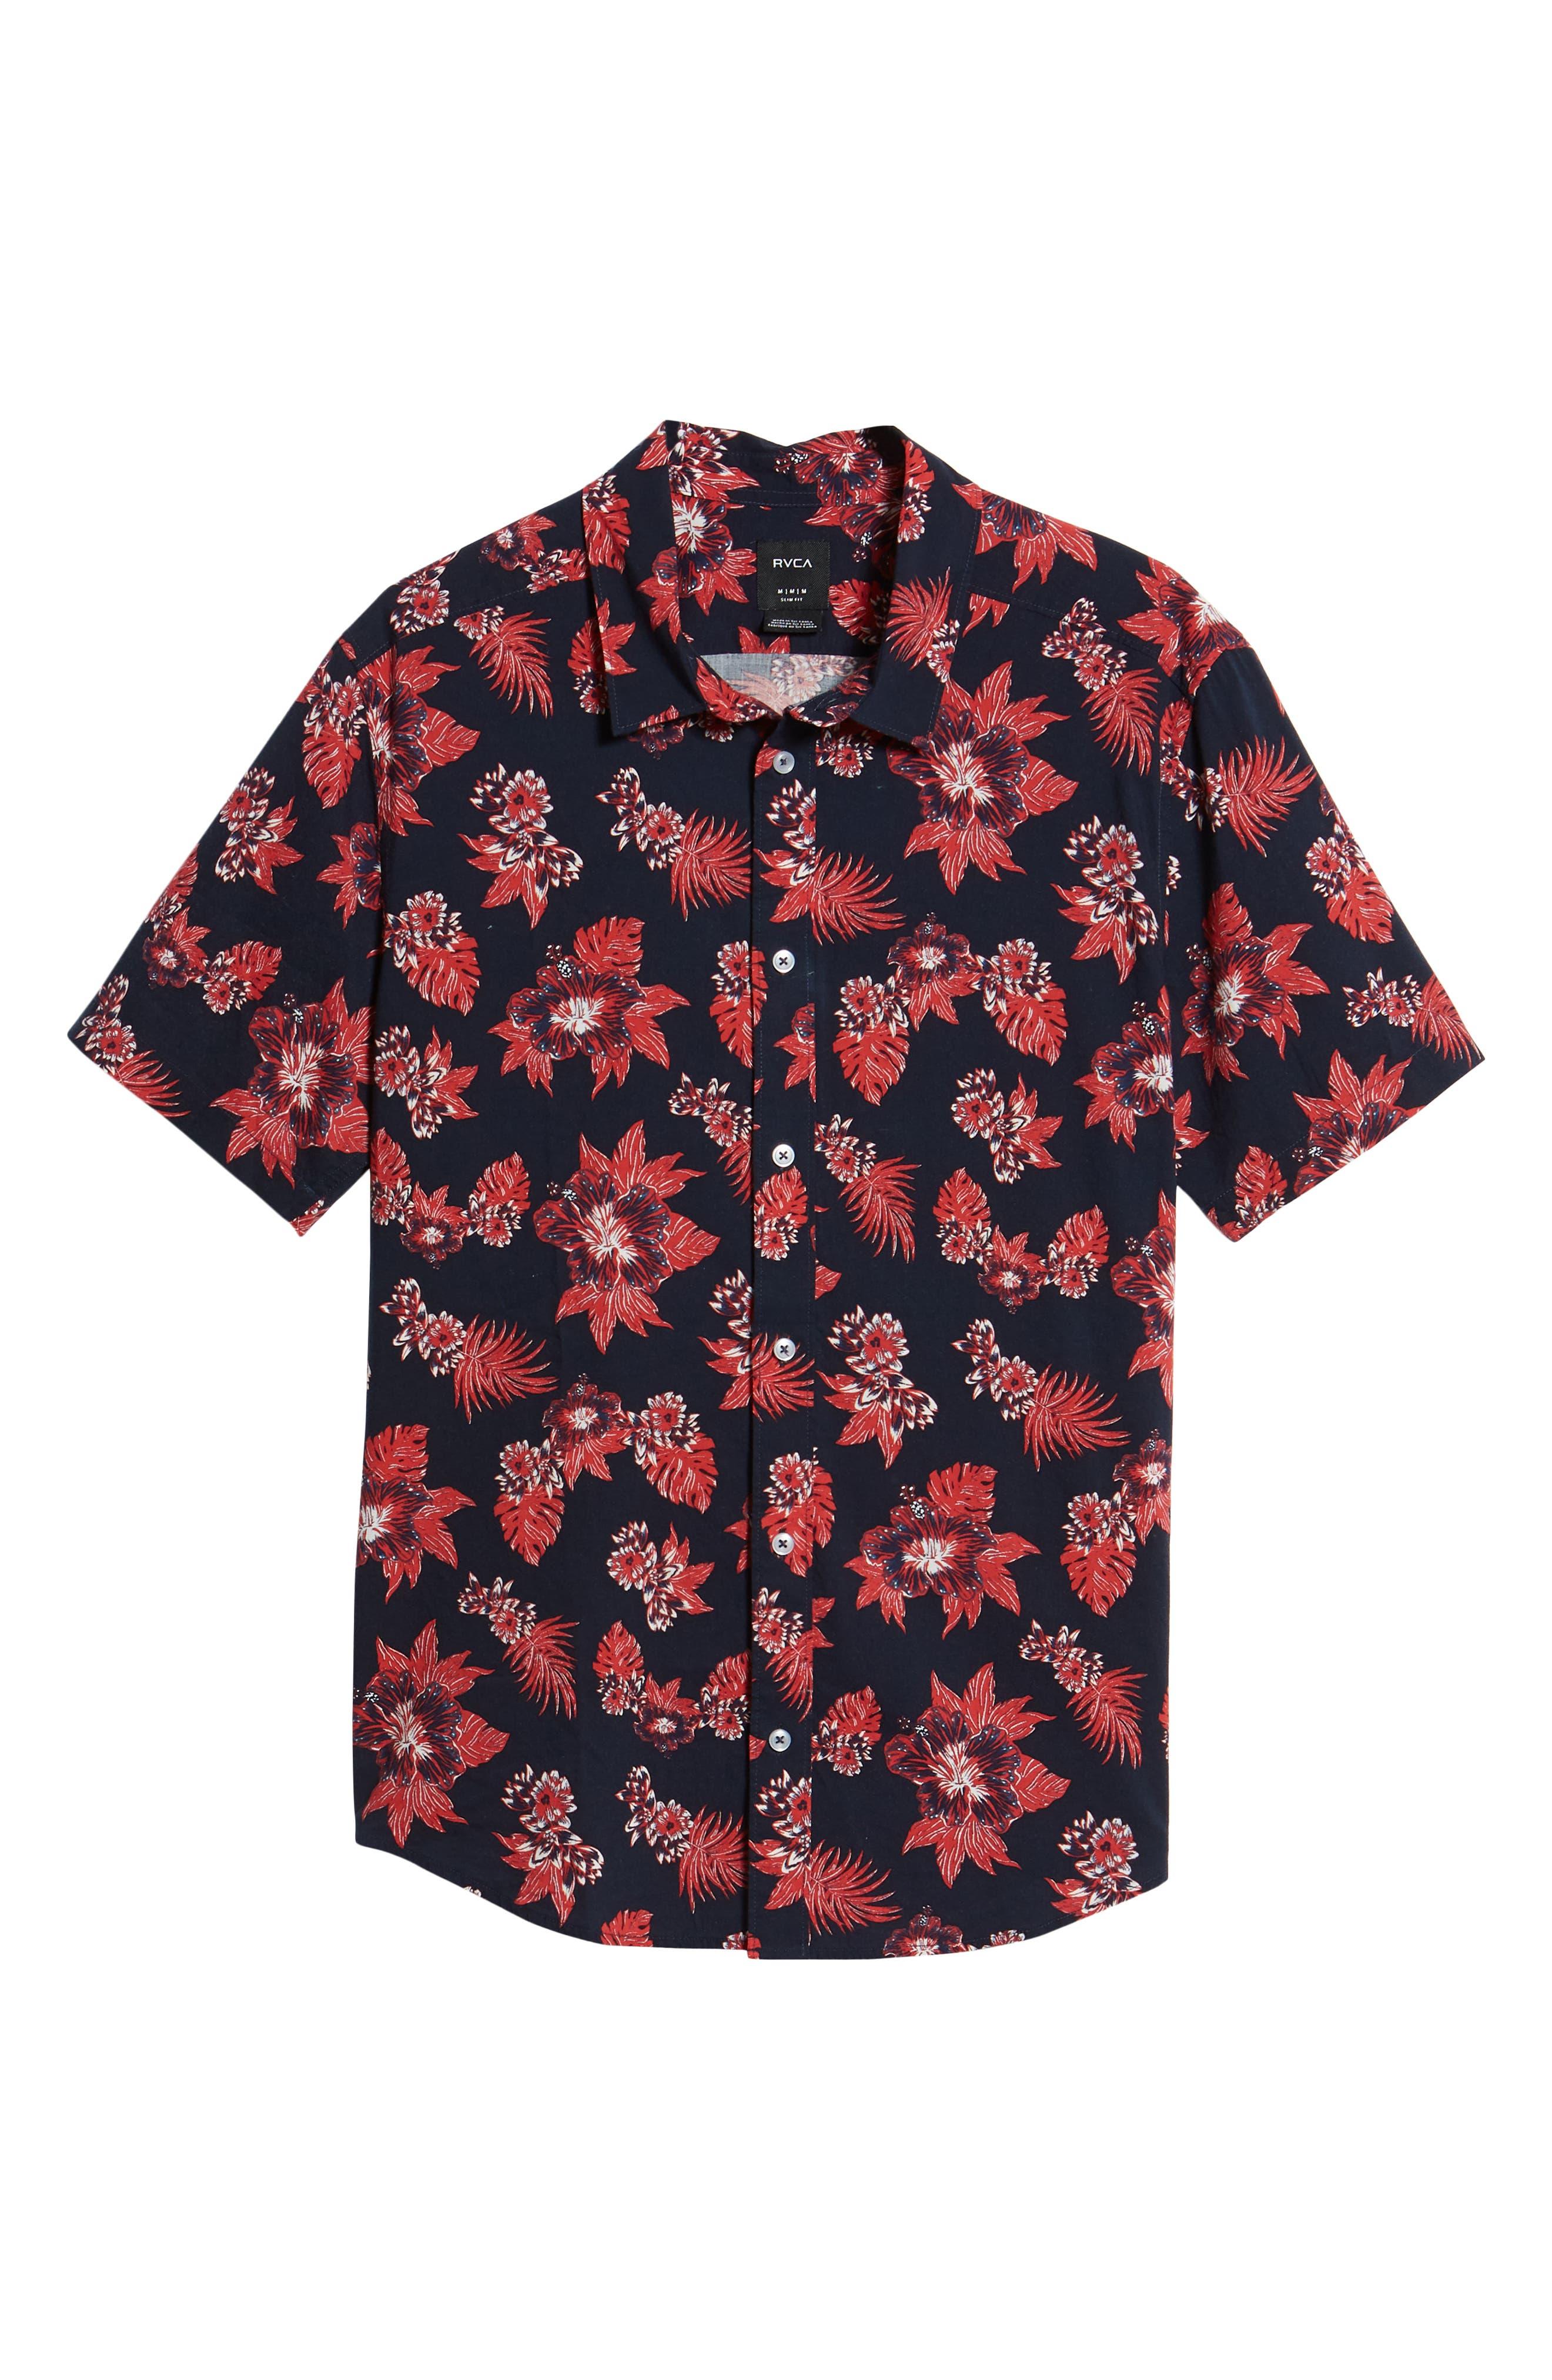 McMillian Woven Shirt,                             Alternate thumbnail 6, color,                             402